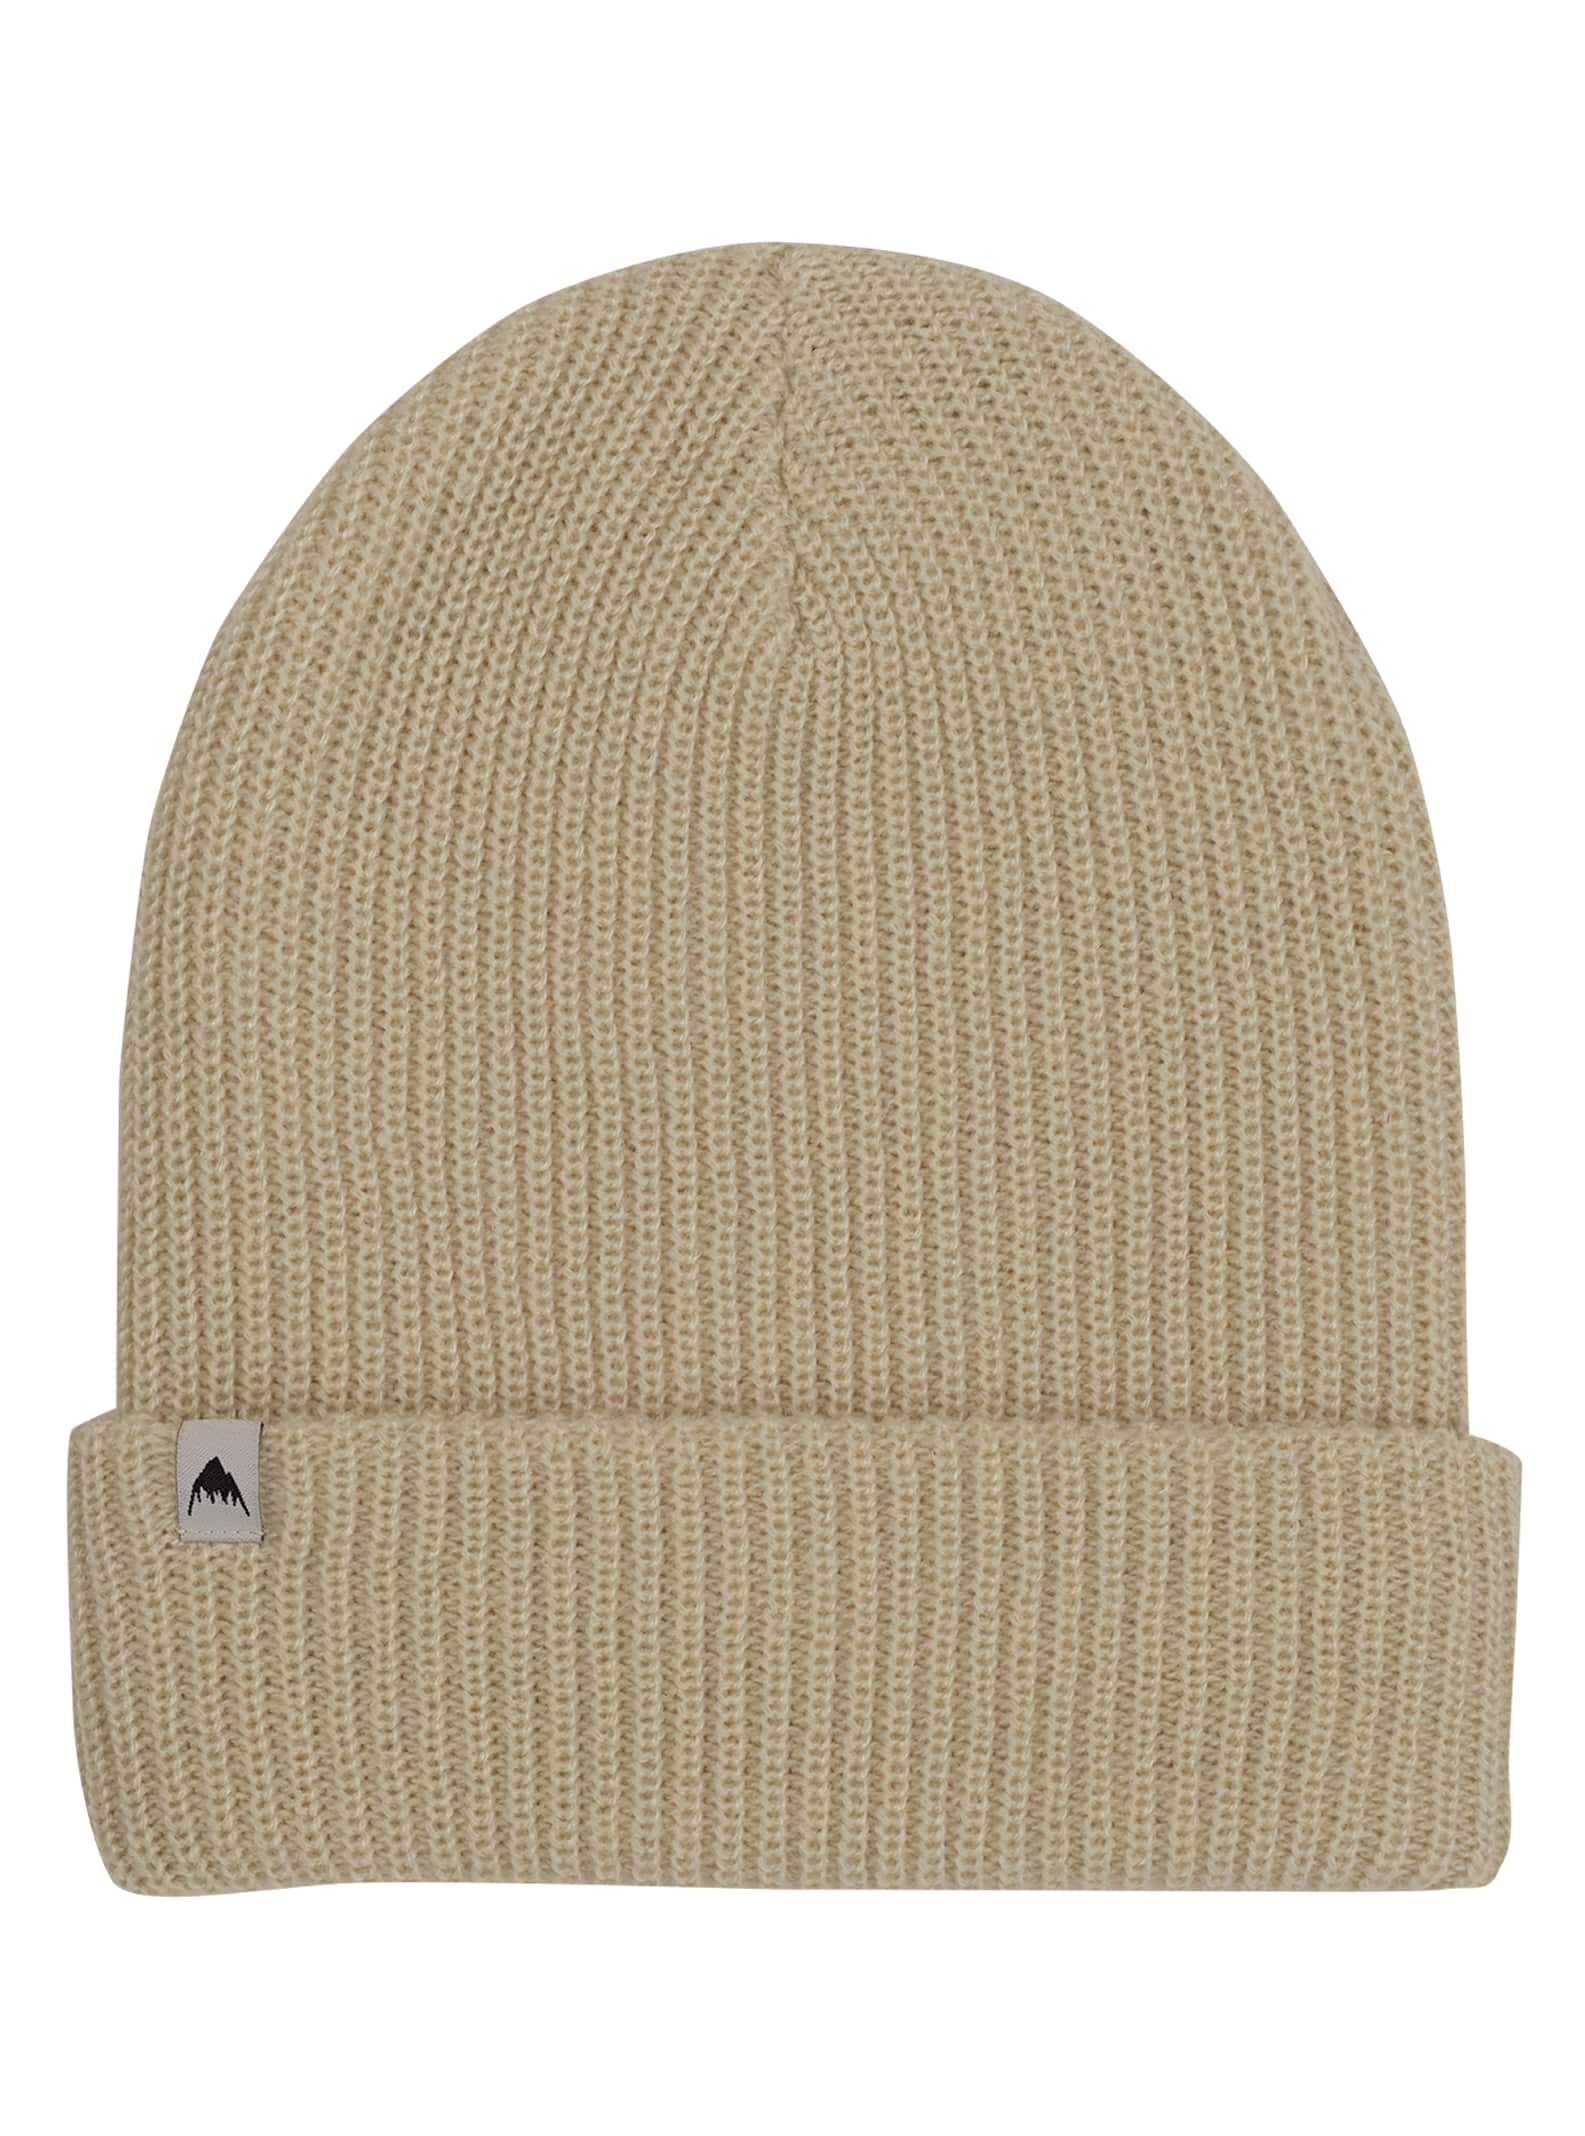 211733b39 Men's Hats & Beanies   Burton Snowboards